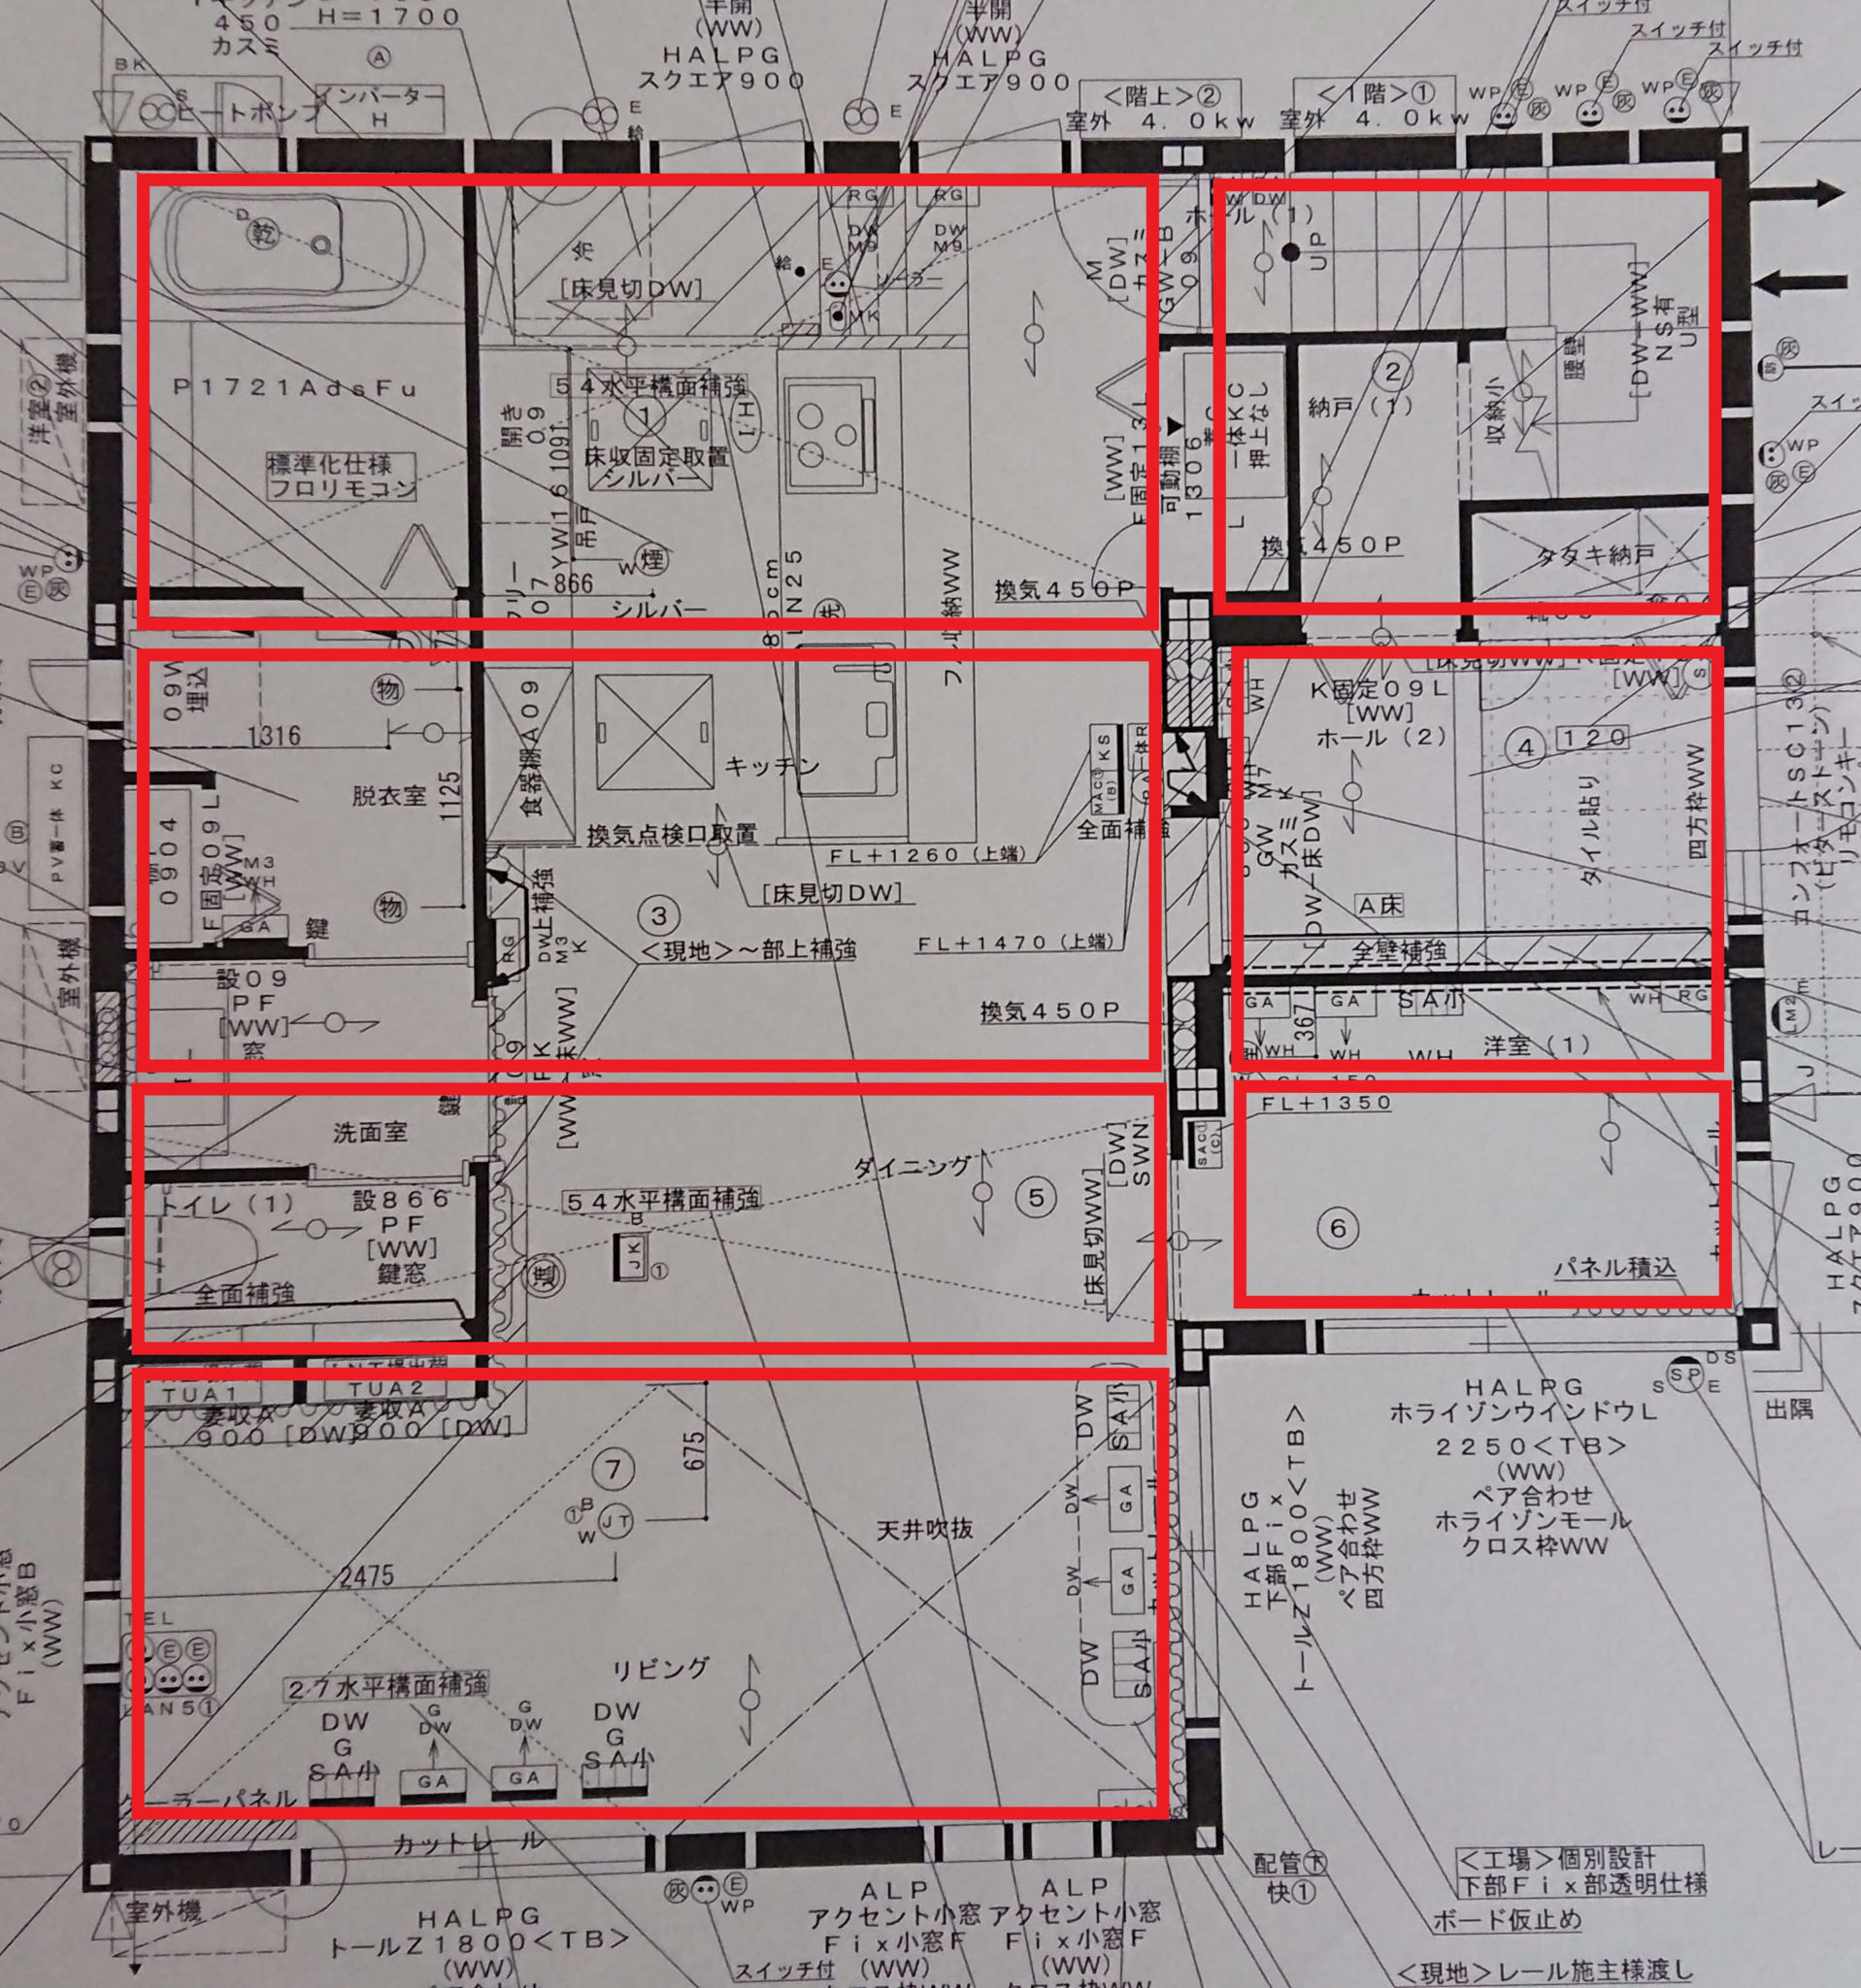 1F部分のユニット配置